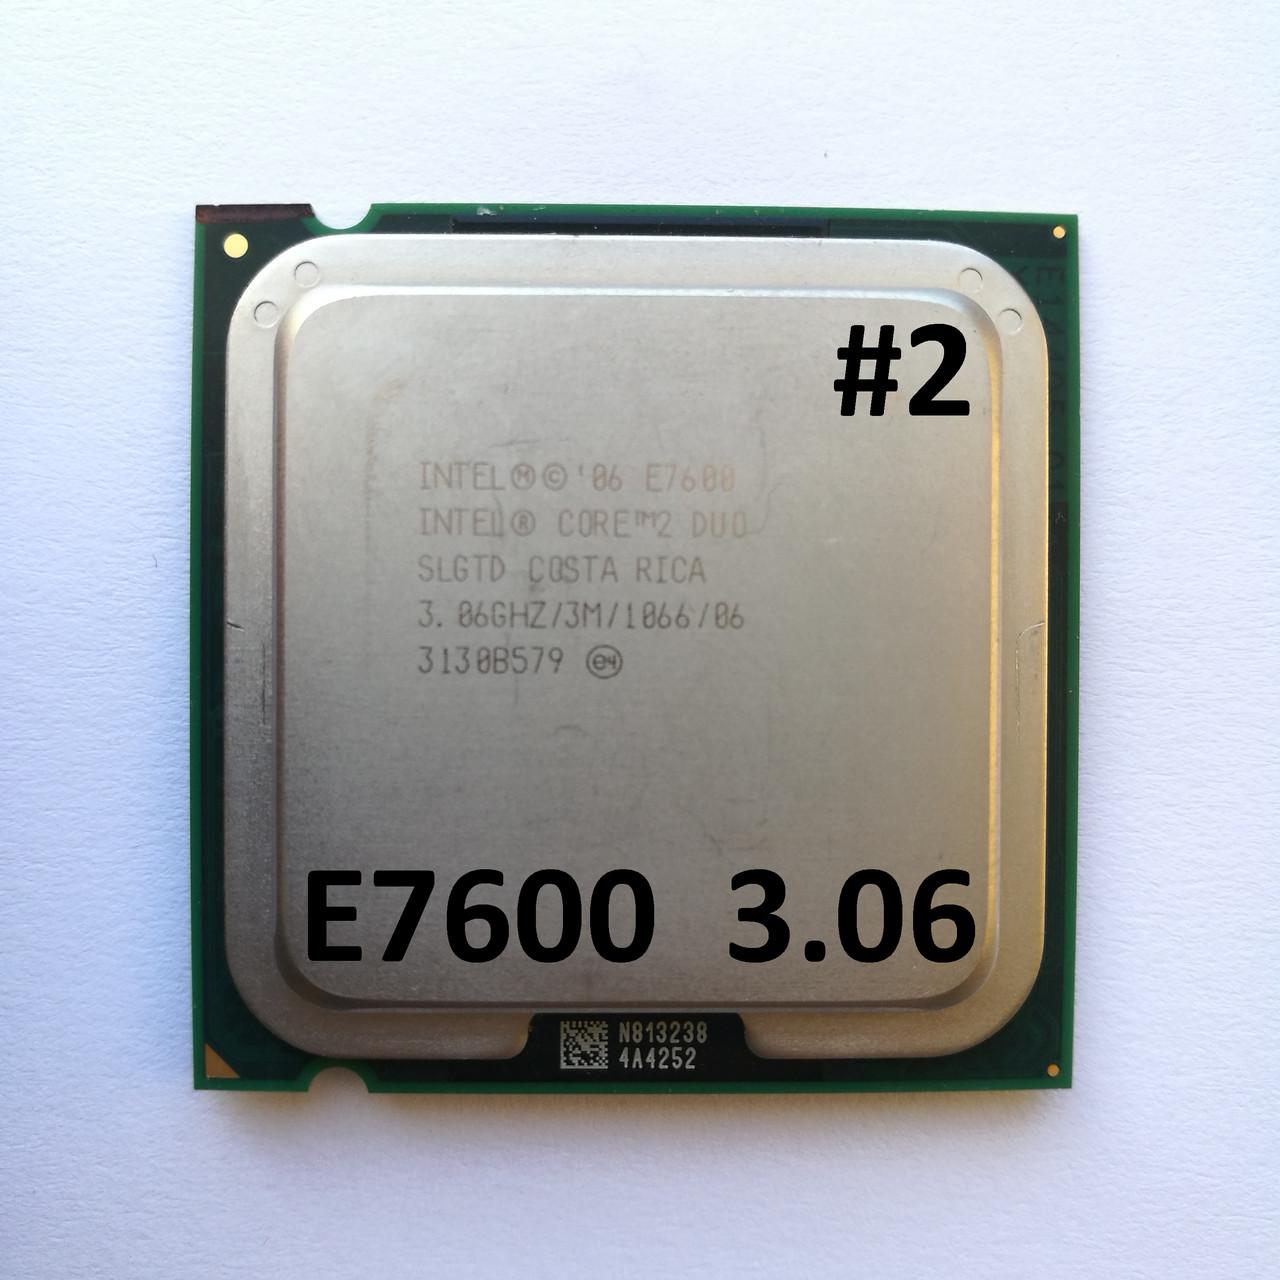 Процессор ЛОТ#2 Intel® Core™2 Duo E7600 R0 SLGTD 3.06GHz 3M Cache 1066 MHz FSB Socket 775 Б/У